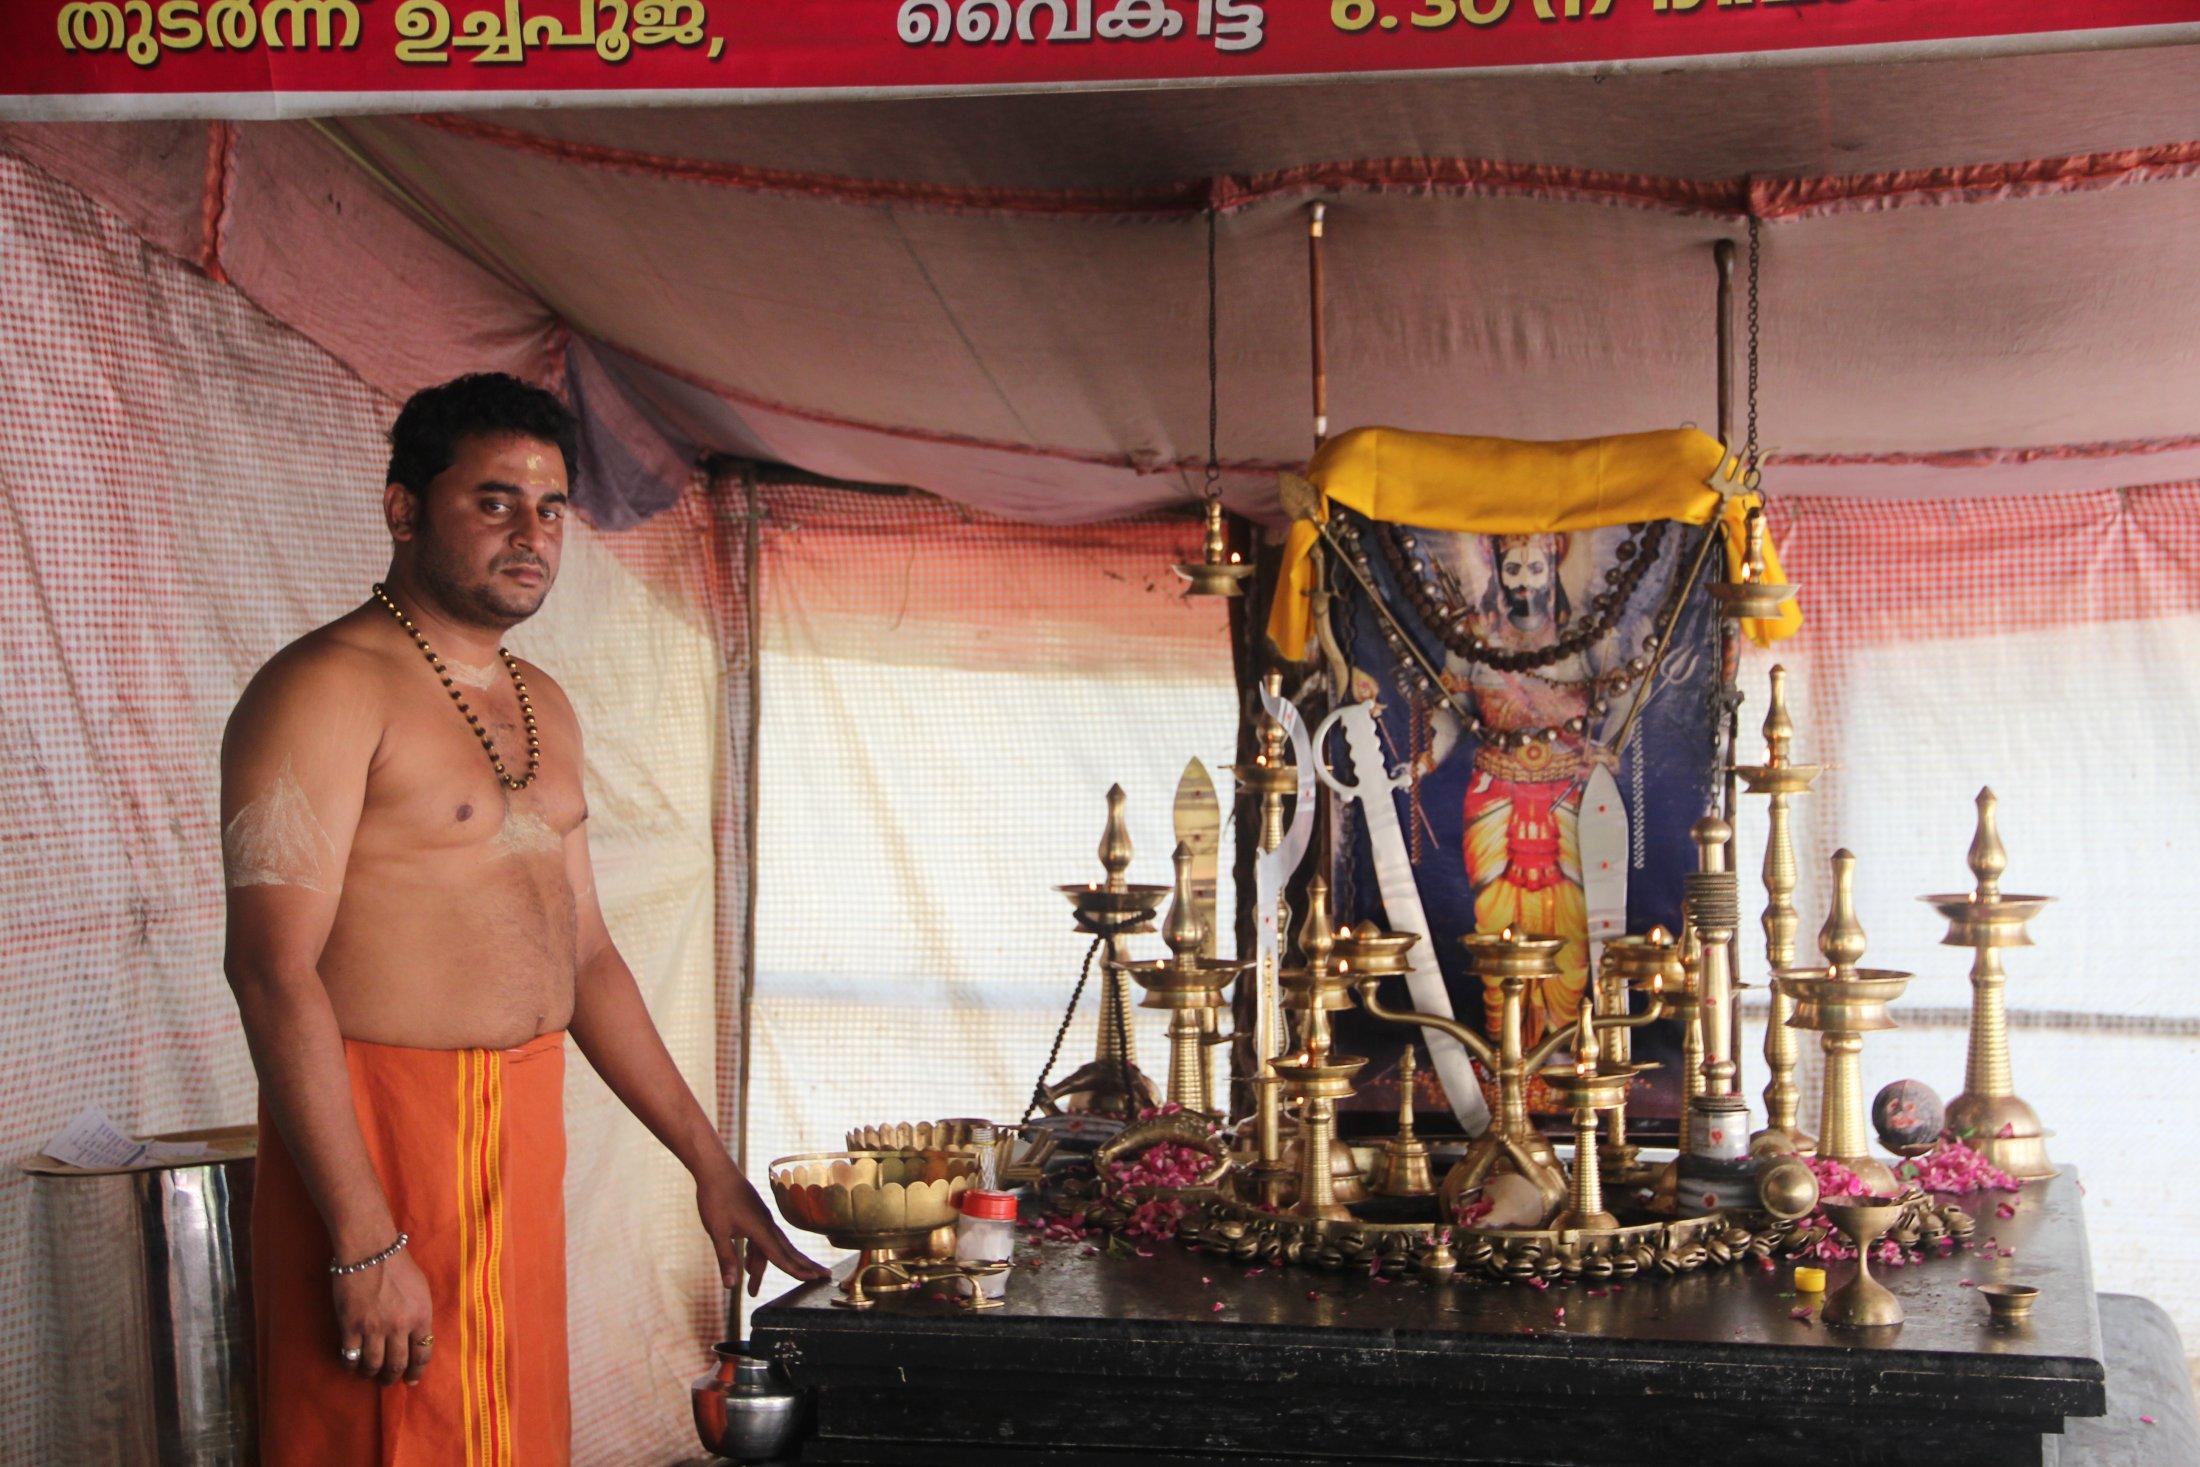 Priest of the Kappiri Temple